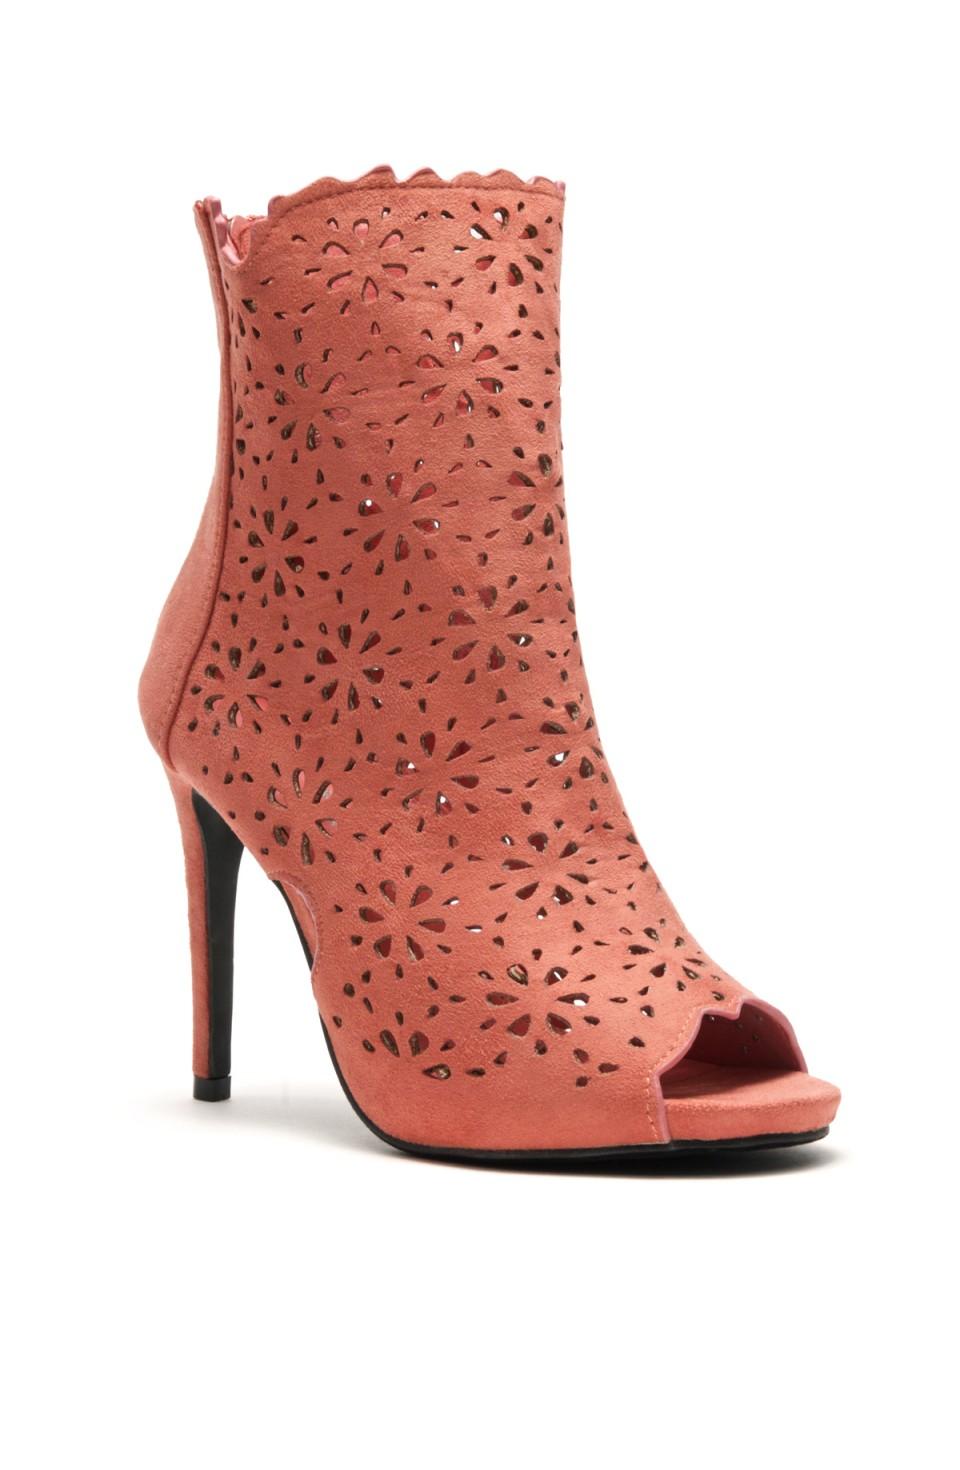 Women's Mauve Cardross peep Toe, Zipper, Stiletto, Lacer cutout design, high heel sexy Booties